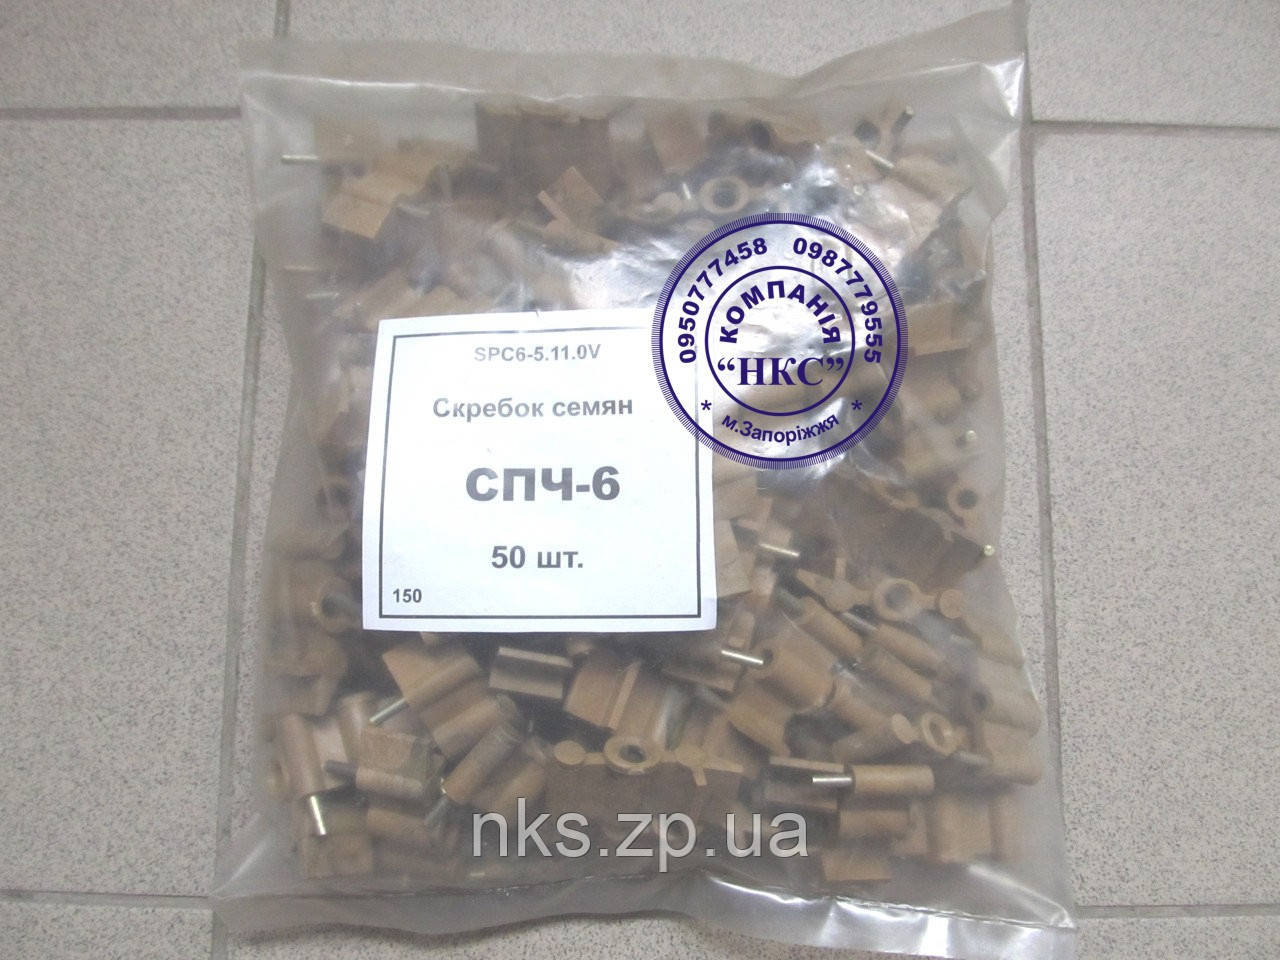 Скребок семян (50 шт.) СПЧ-6, СПП-8.